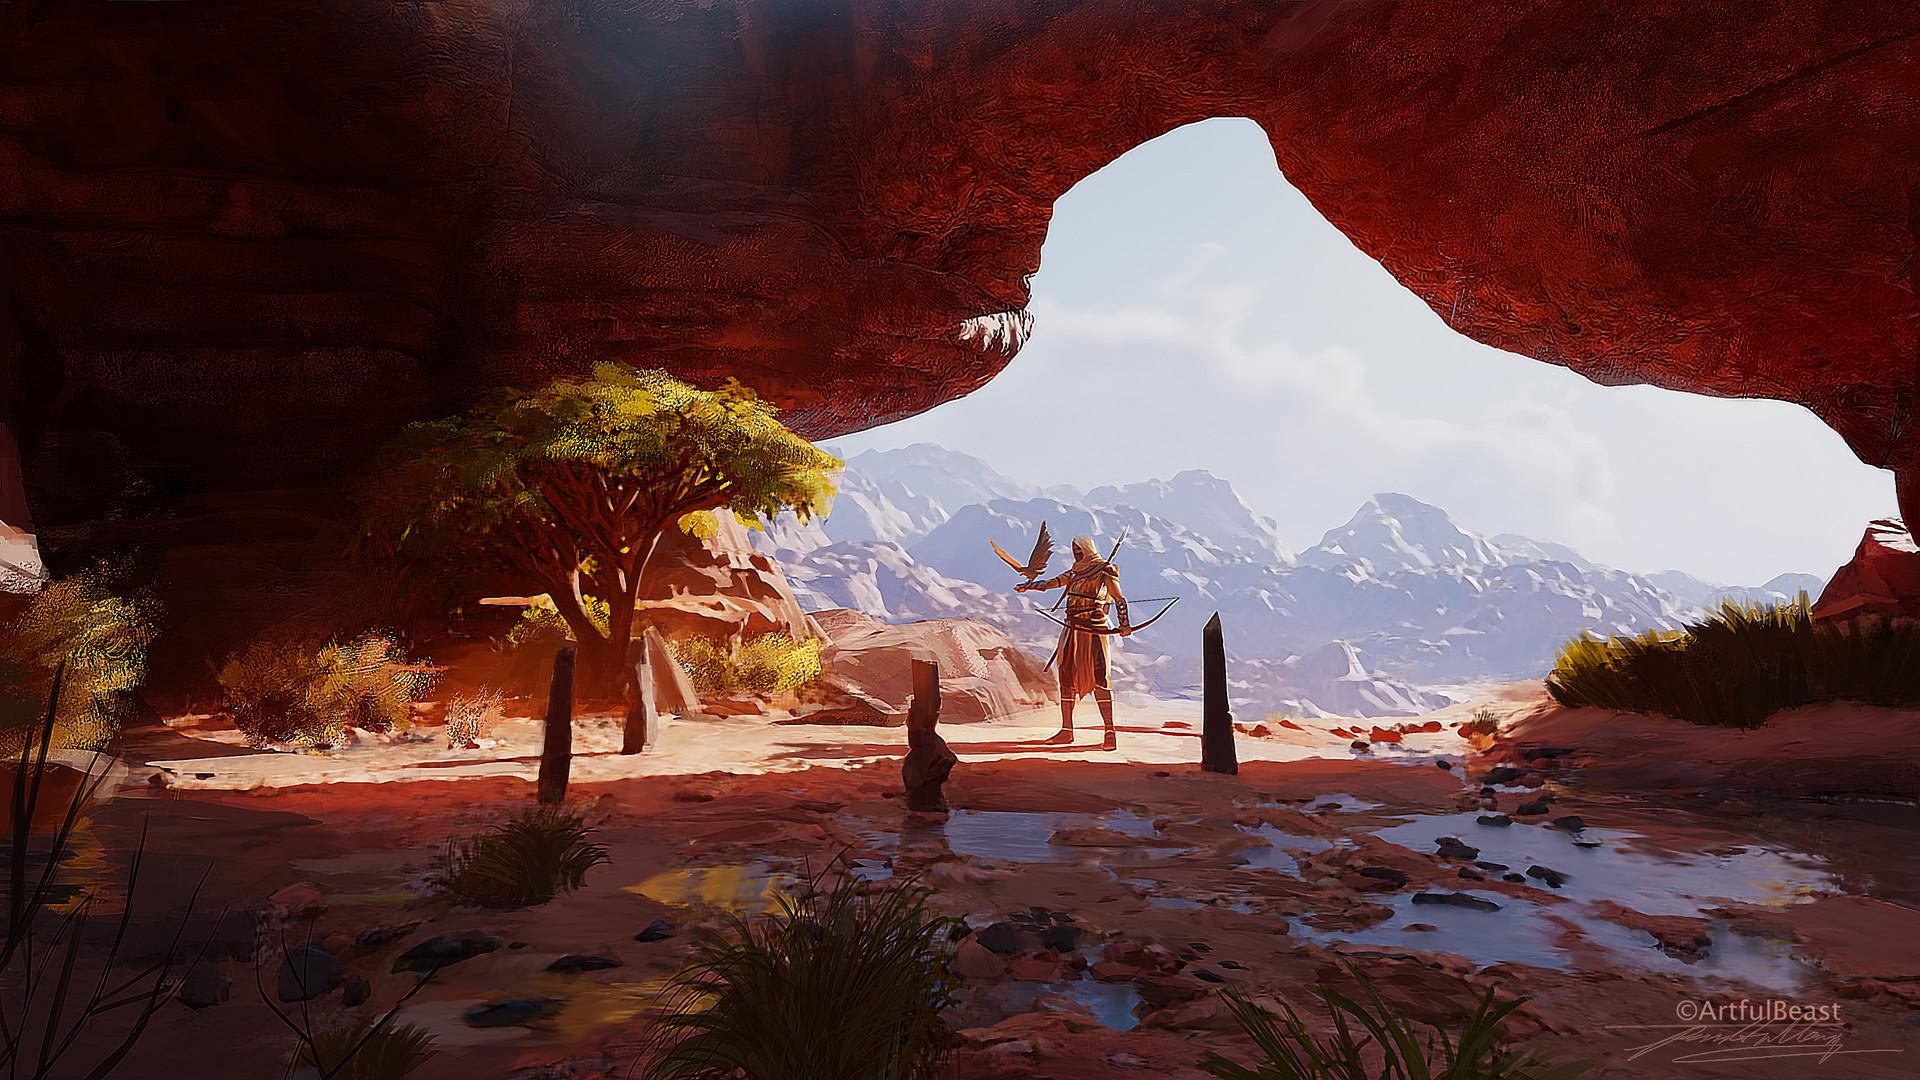 Assassins creed origins fanart hd games 4k wallpapers for Assassin s creed sfondi